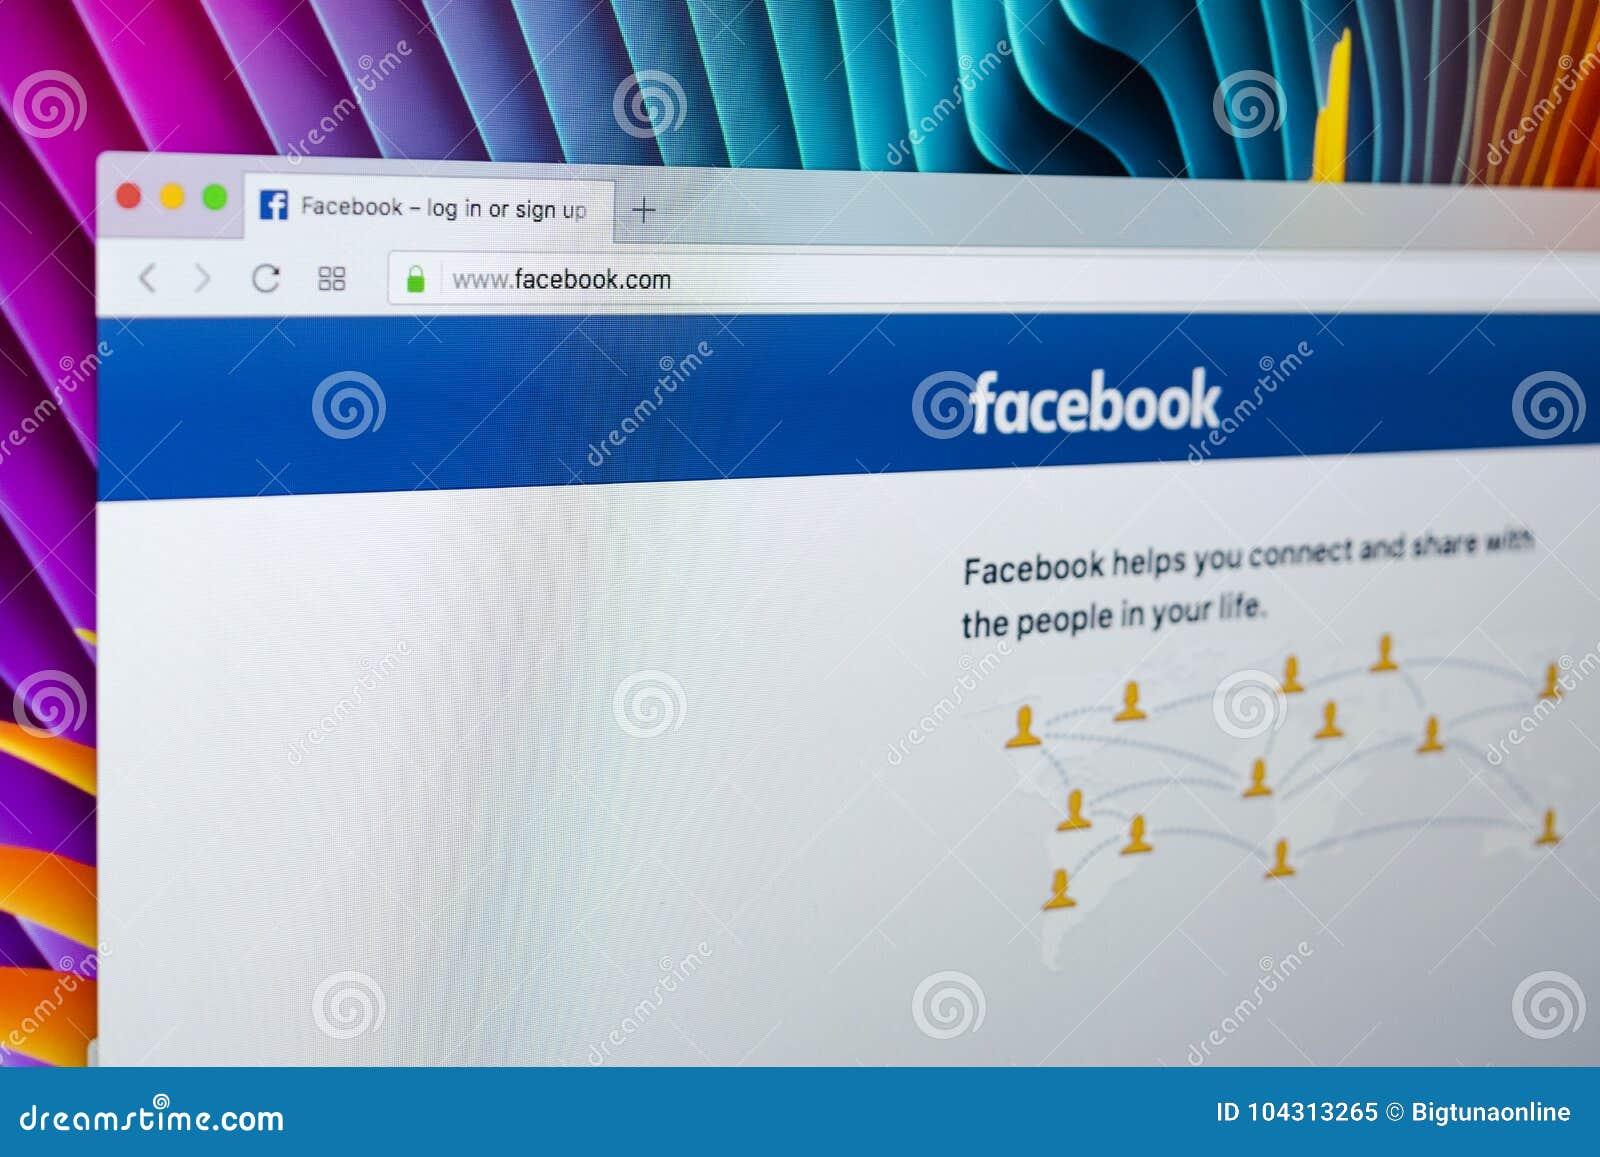 Home login facebook pp com www page Facebook login